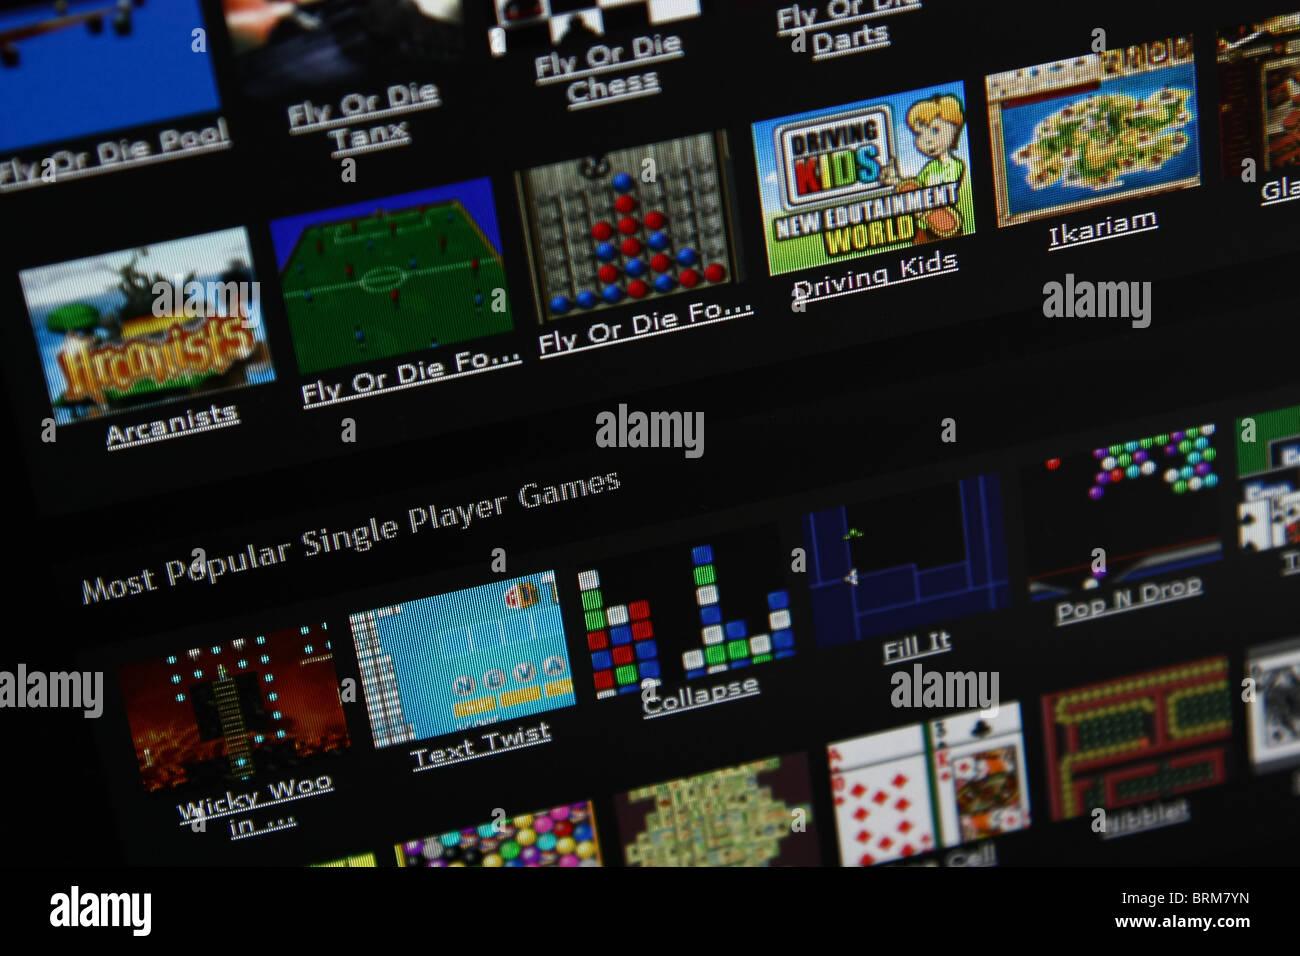 online gaming arcade - Stock Image